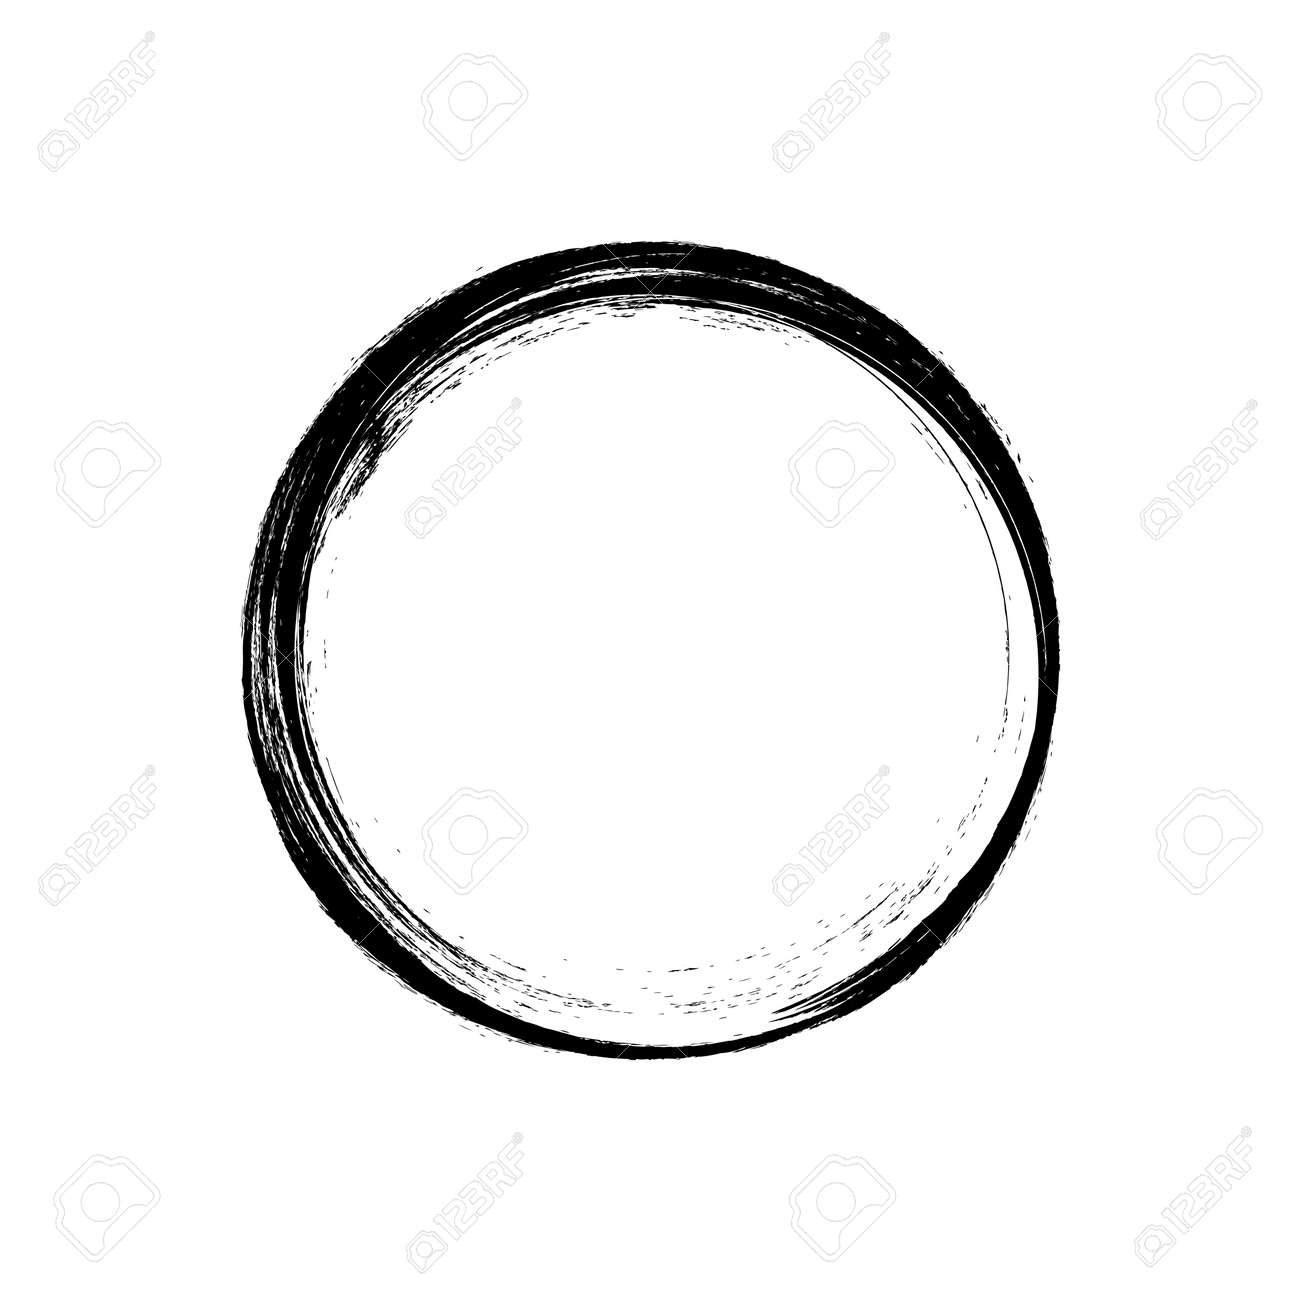 black circle hand drawn concept, circle shaped grunge brush strokes. - 156825005